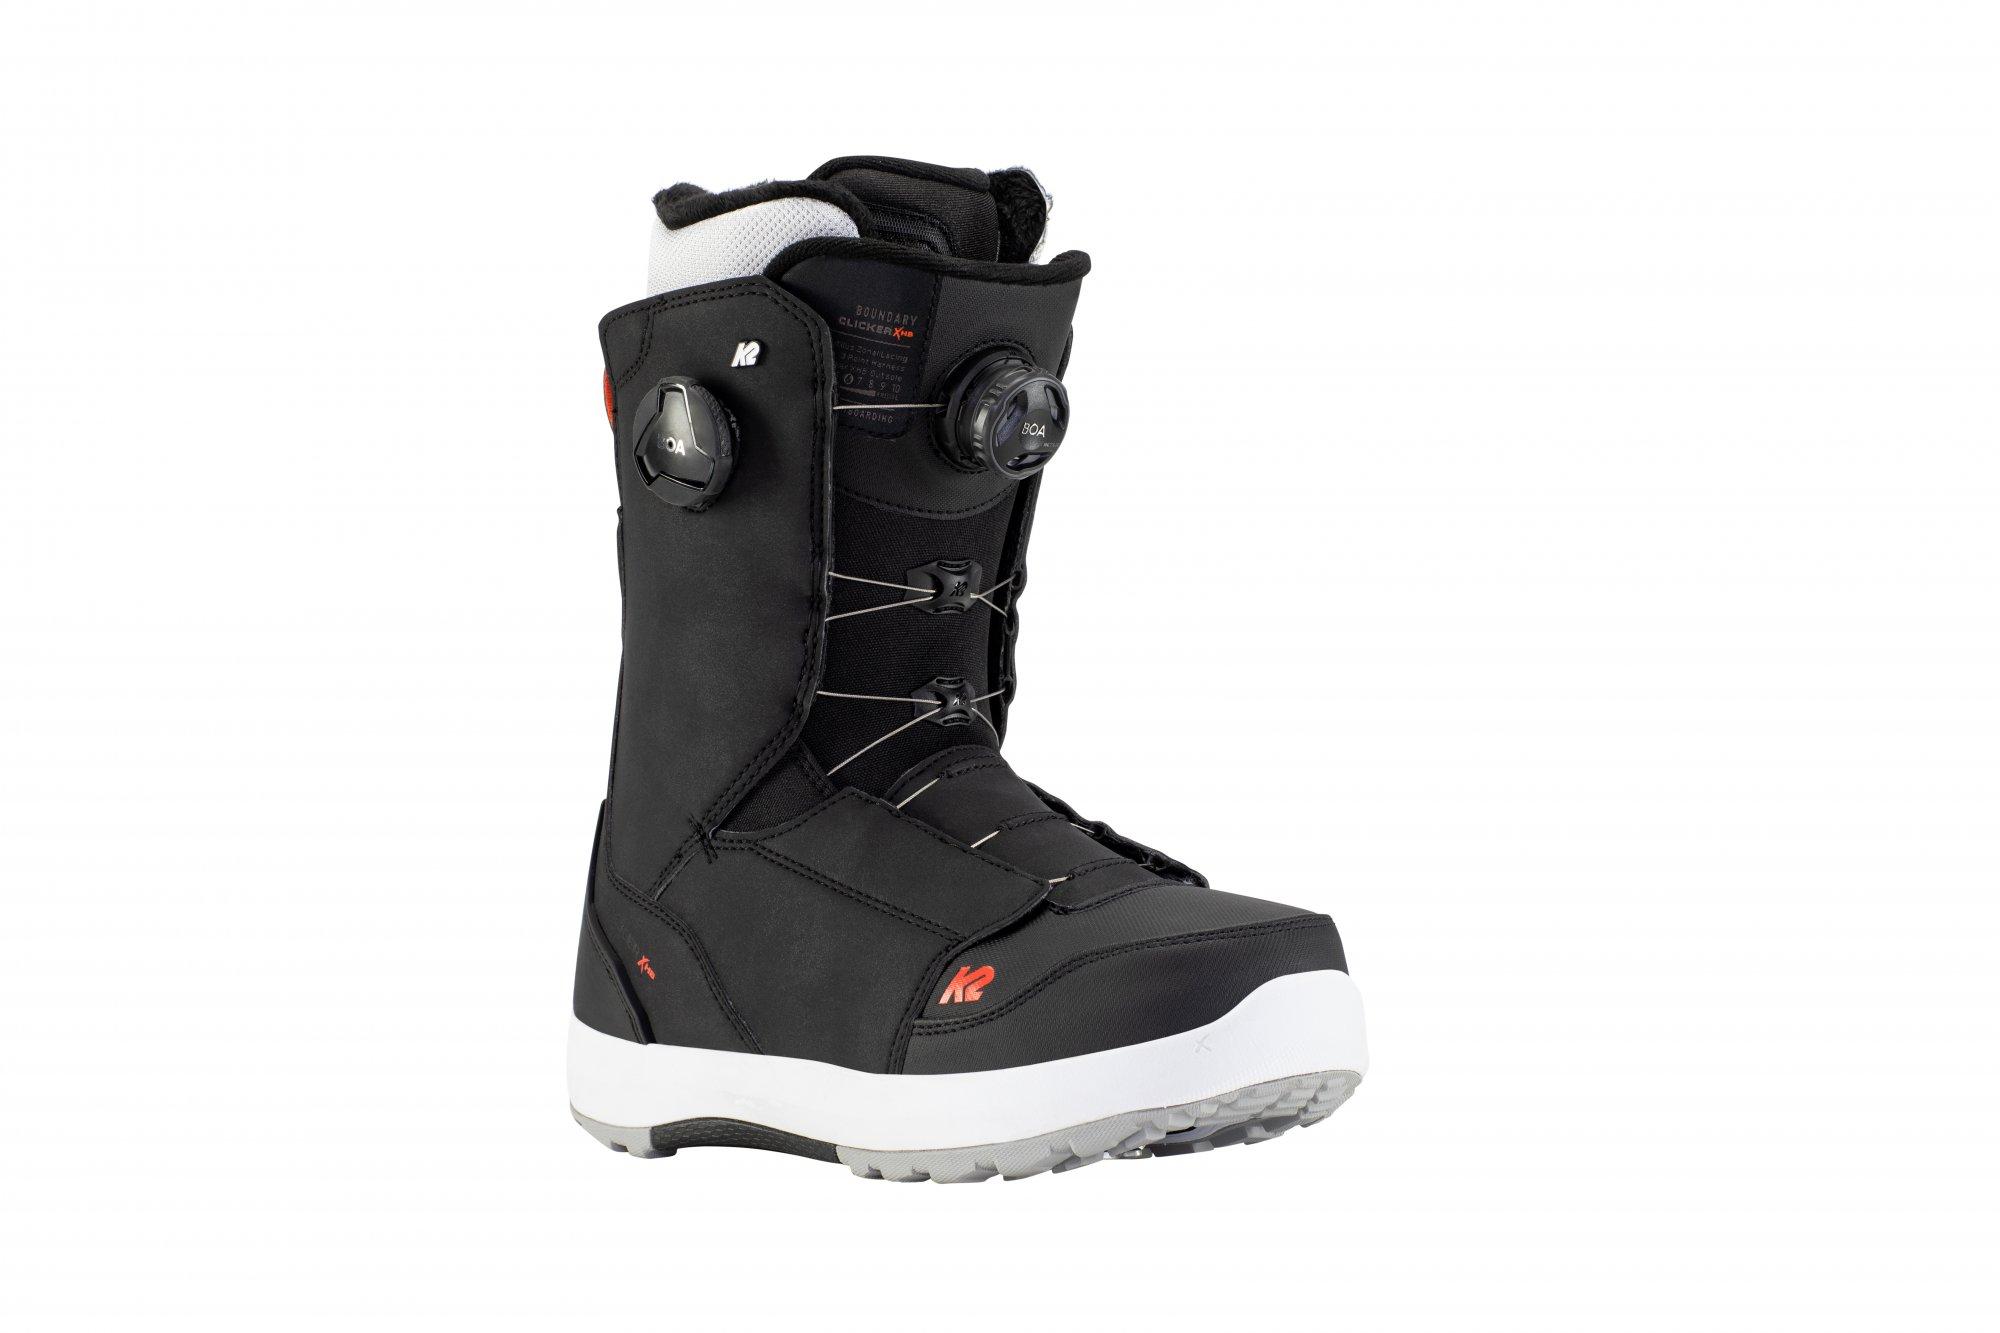 2021 K2 Boundary Clicker X HB Men's Snowboard Boots